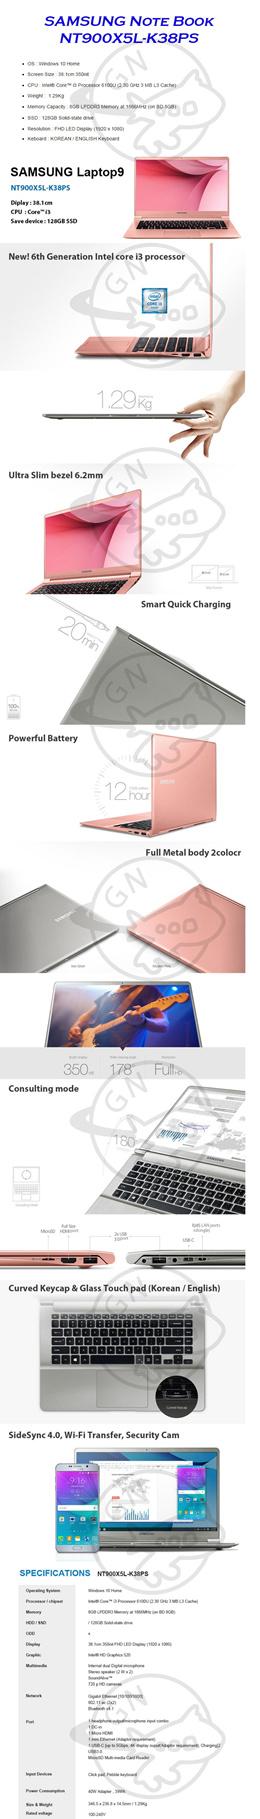 SAMSUNG SAMSUNG Notebook 9 Metal NT900X5L-K38PS Lite Laptop Windows10 / 6th SSD / Core i3 / Samsung